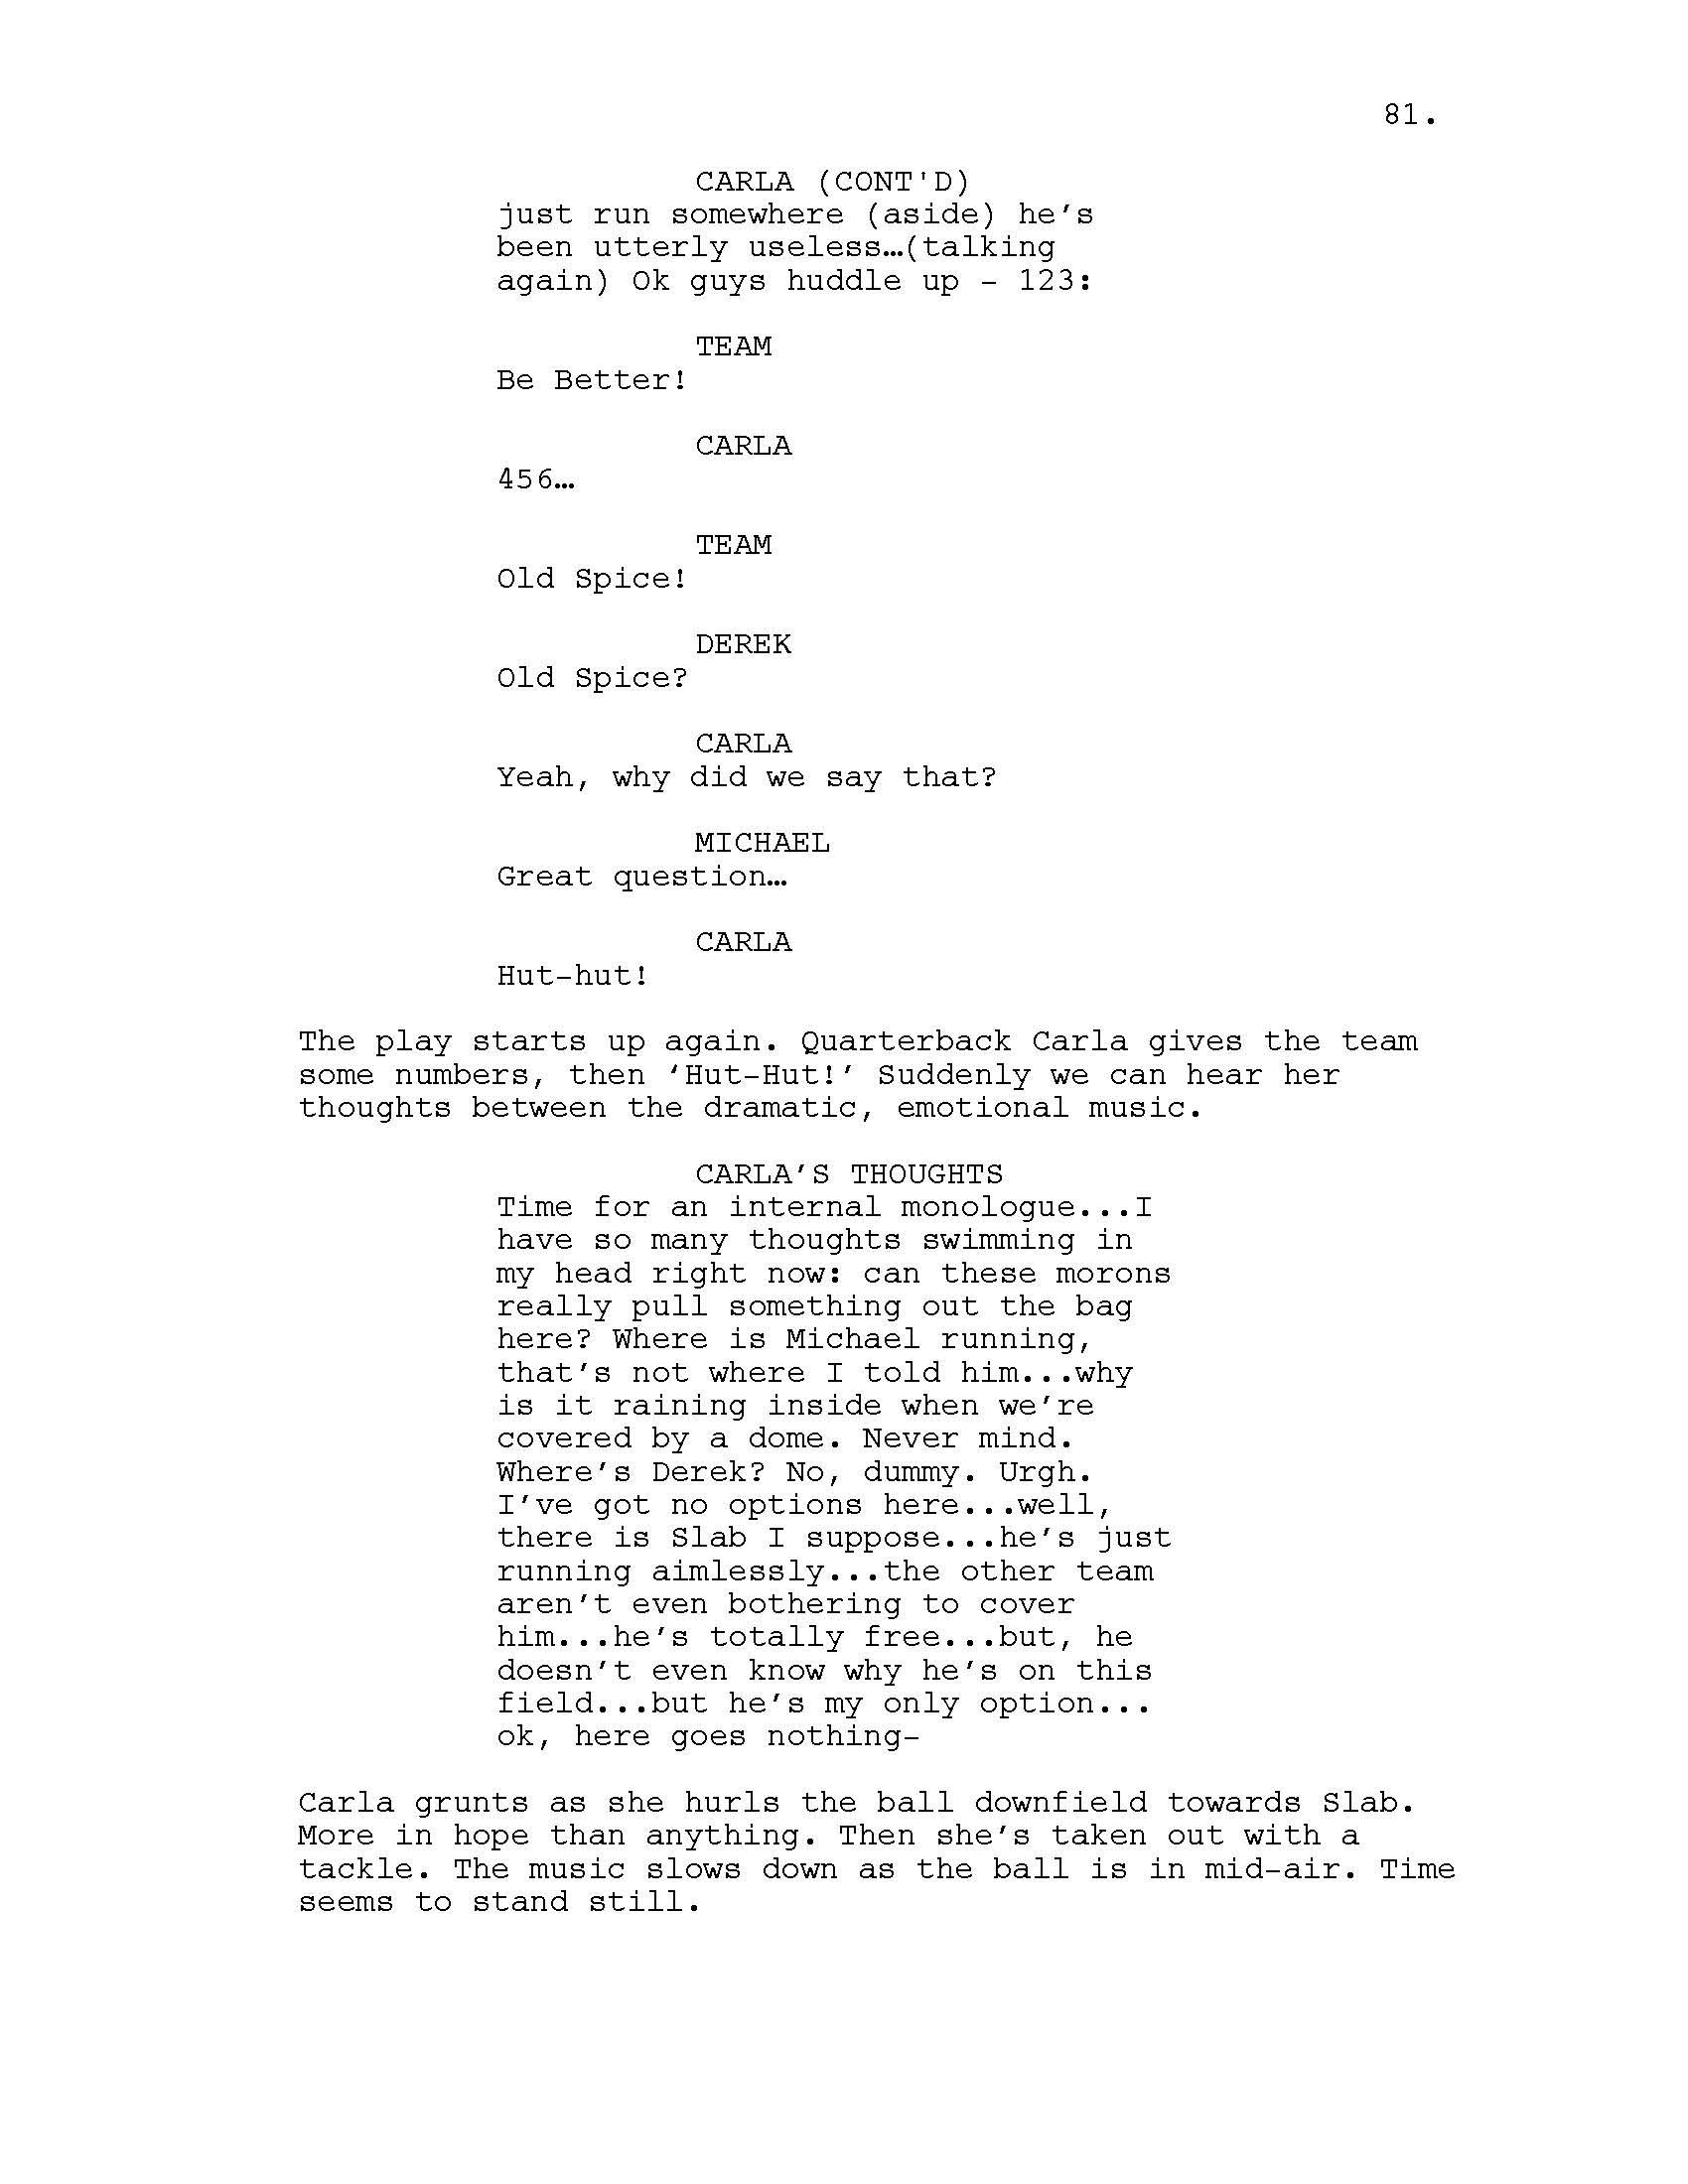 INVISIBLE WORLD SCRIPT_Page_082.jpg